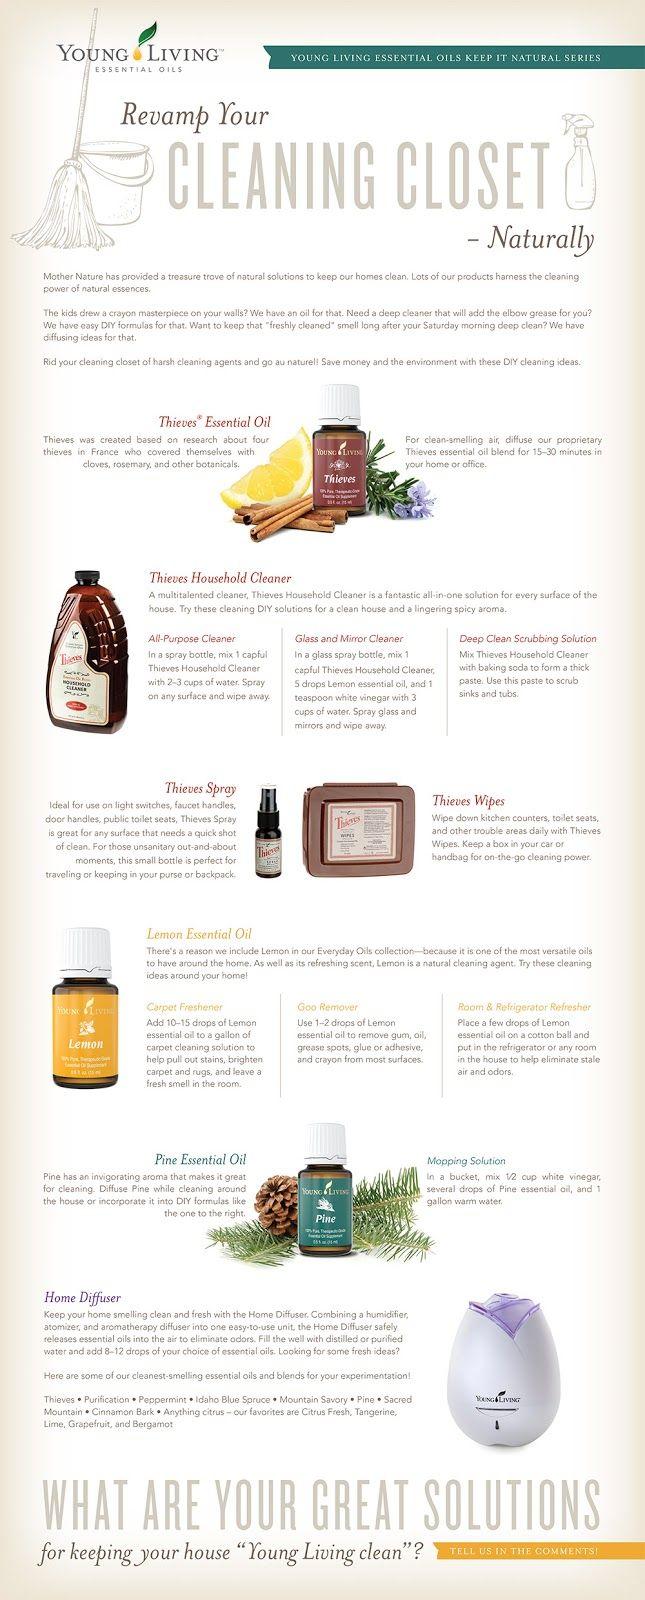 AllergenFreeMom.com: The Story Behind Thieves Essential Oil